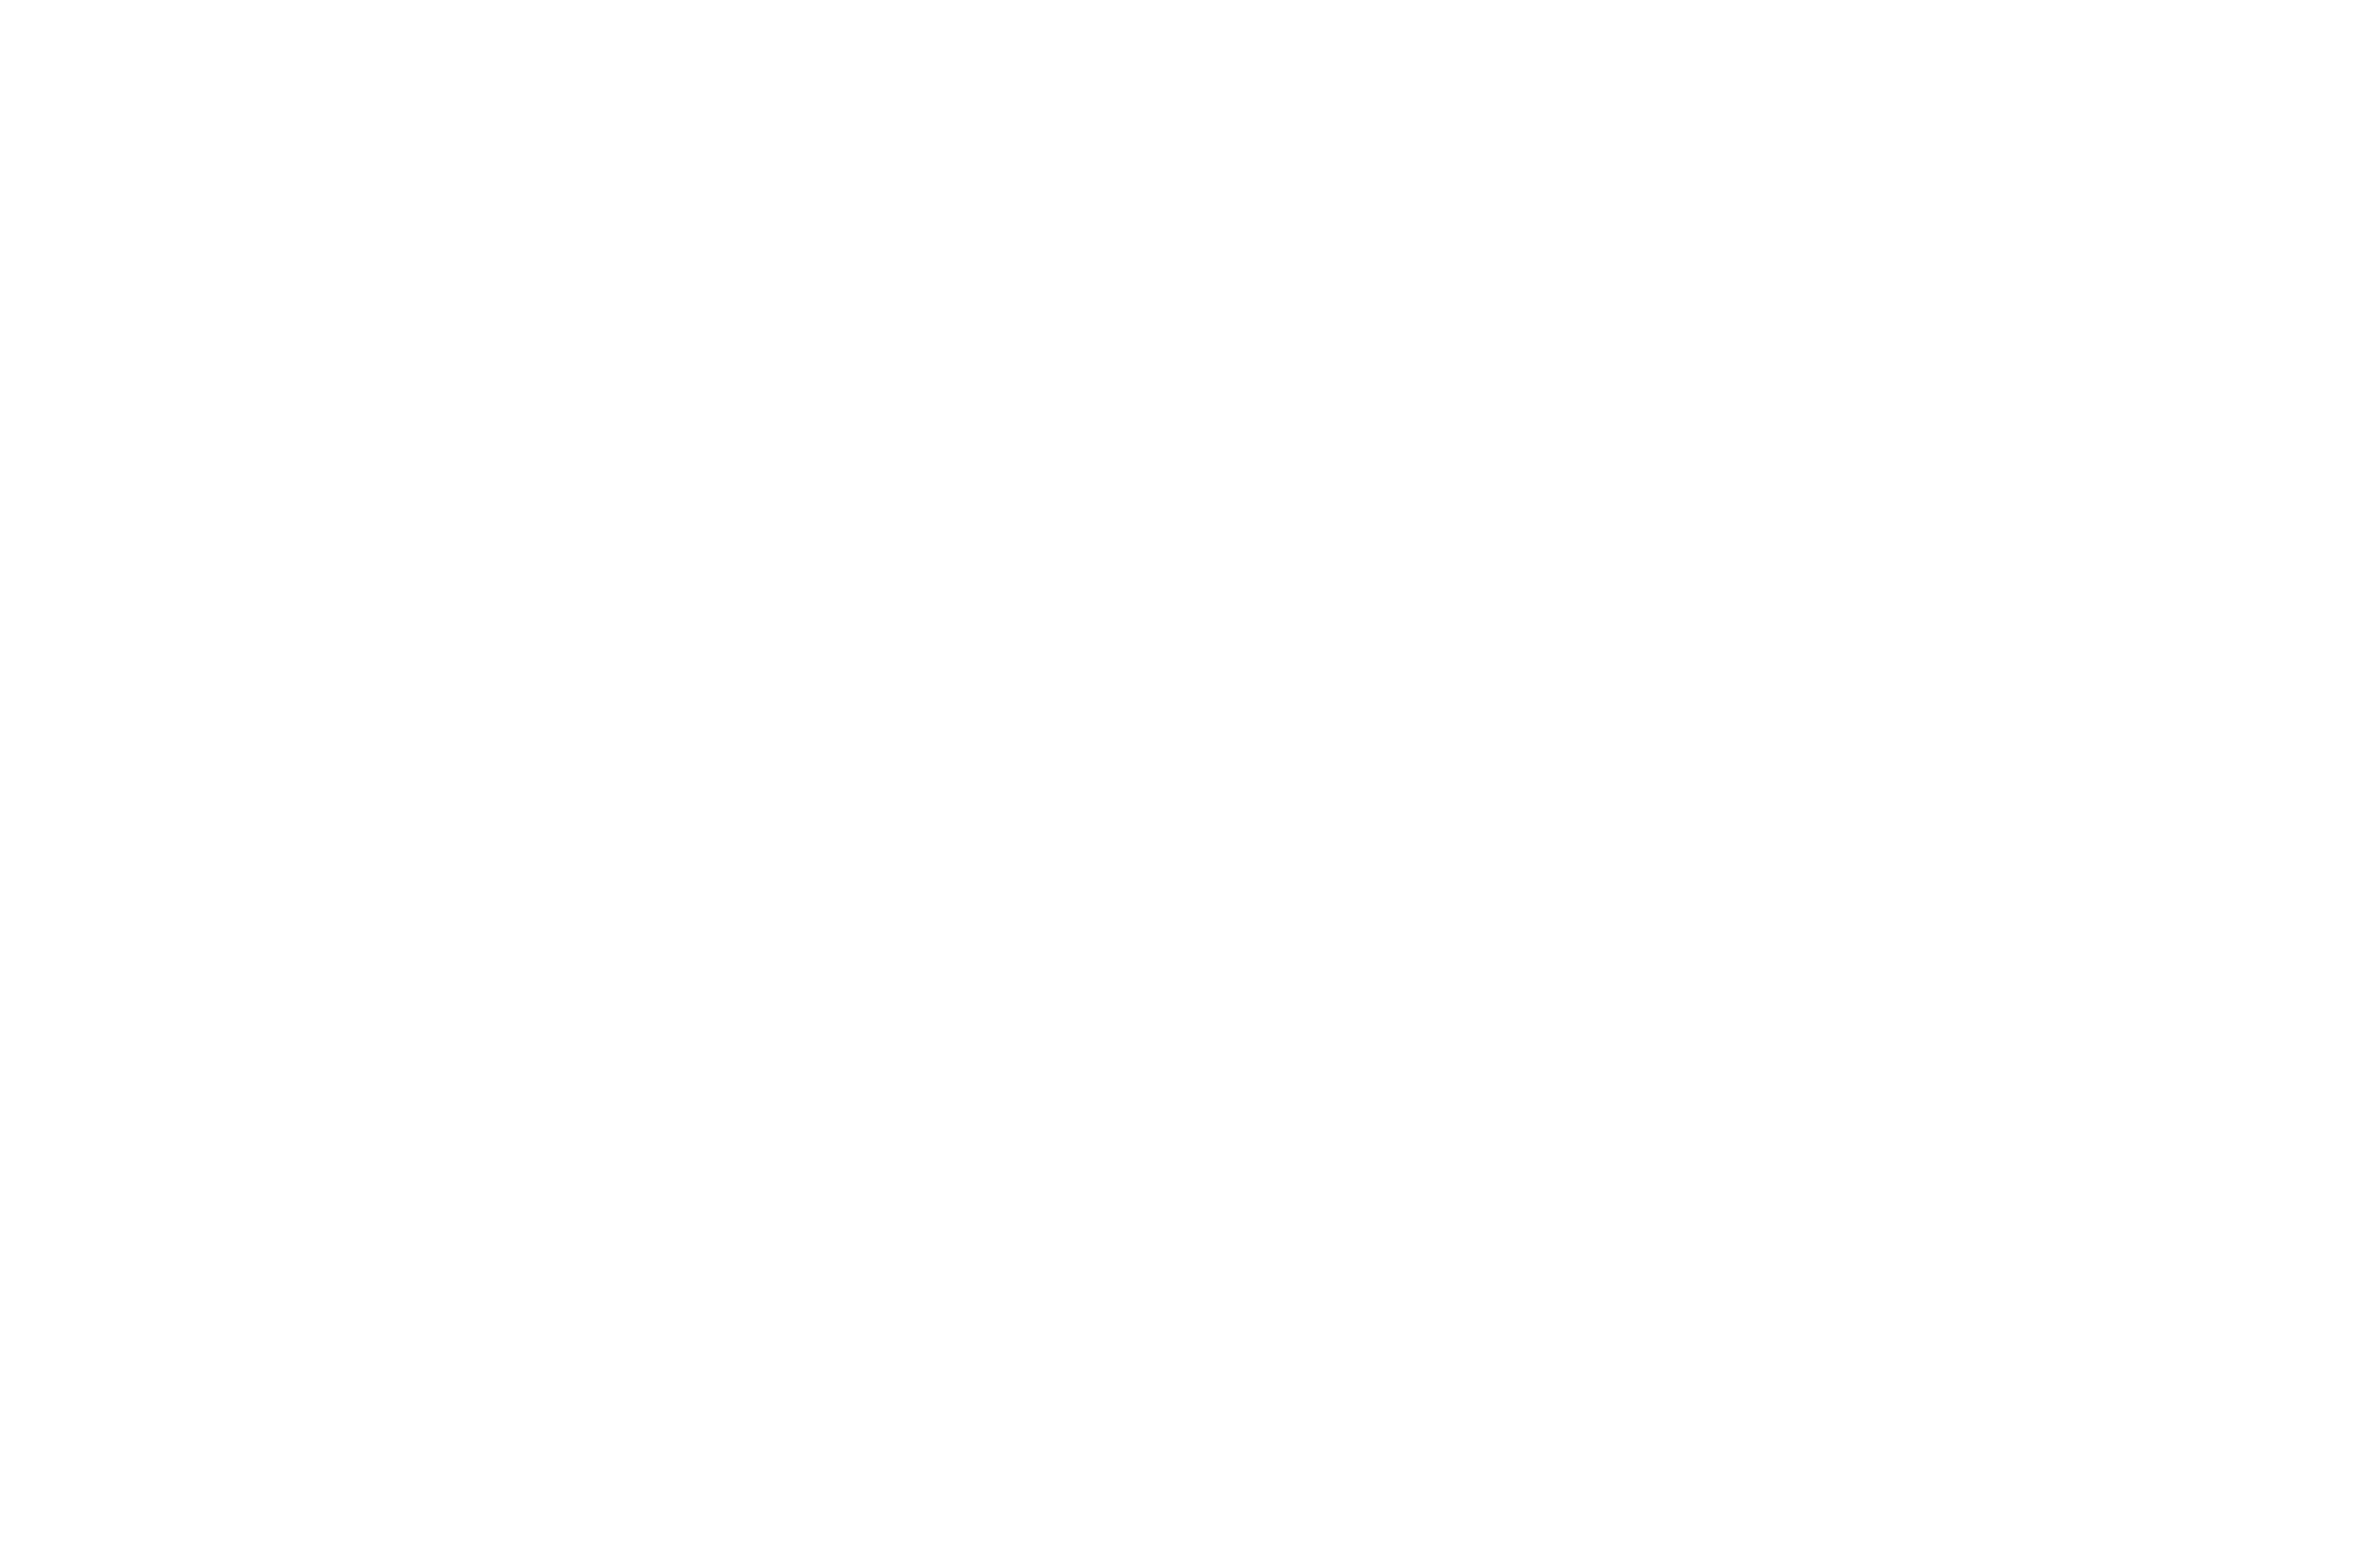 cellar_b828d165-1c22-11ea-8c1f-01aa75ed71a1.0004.02_doc_1-1